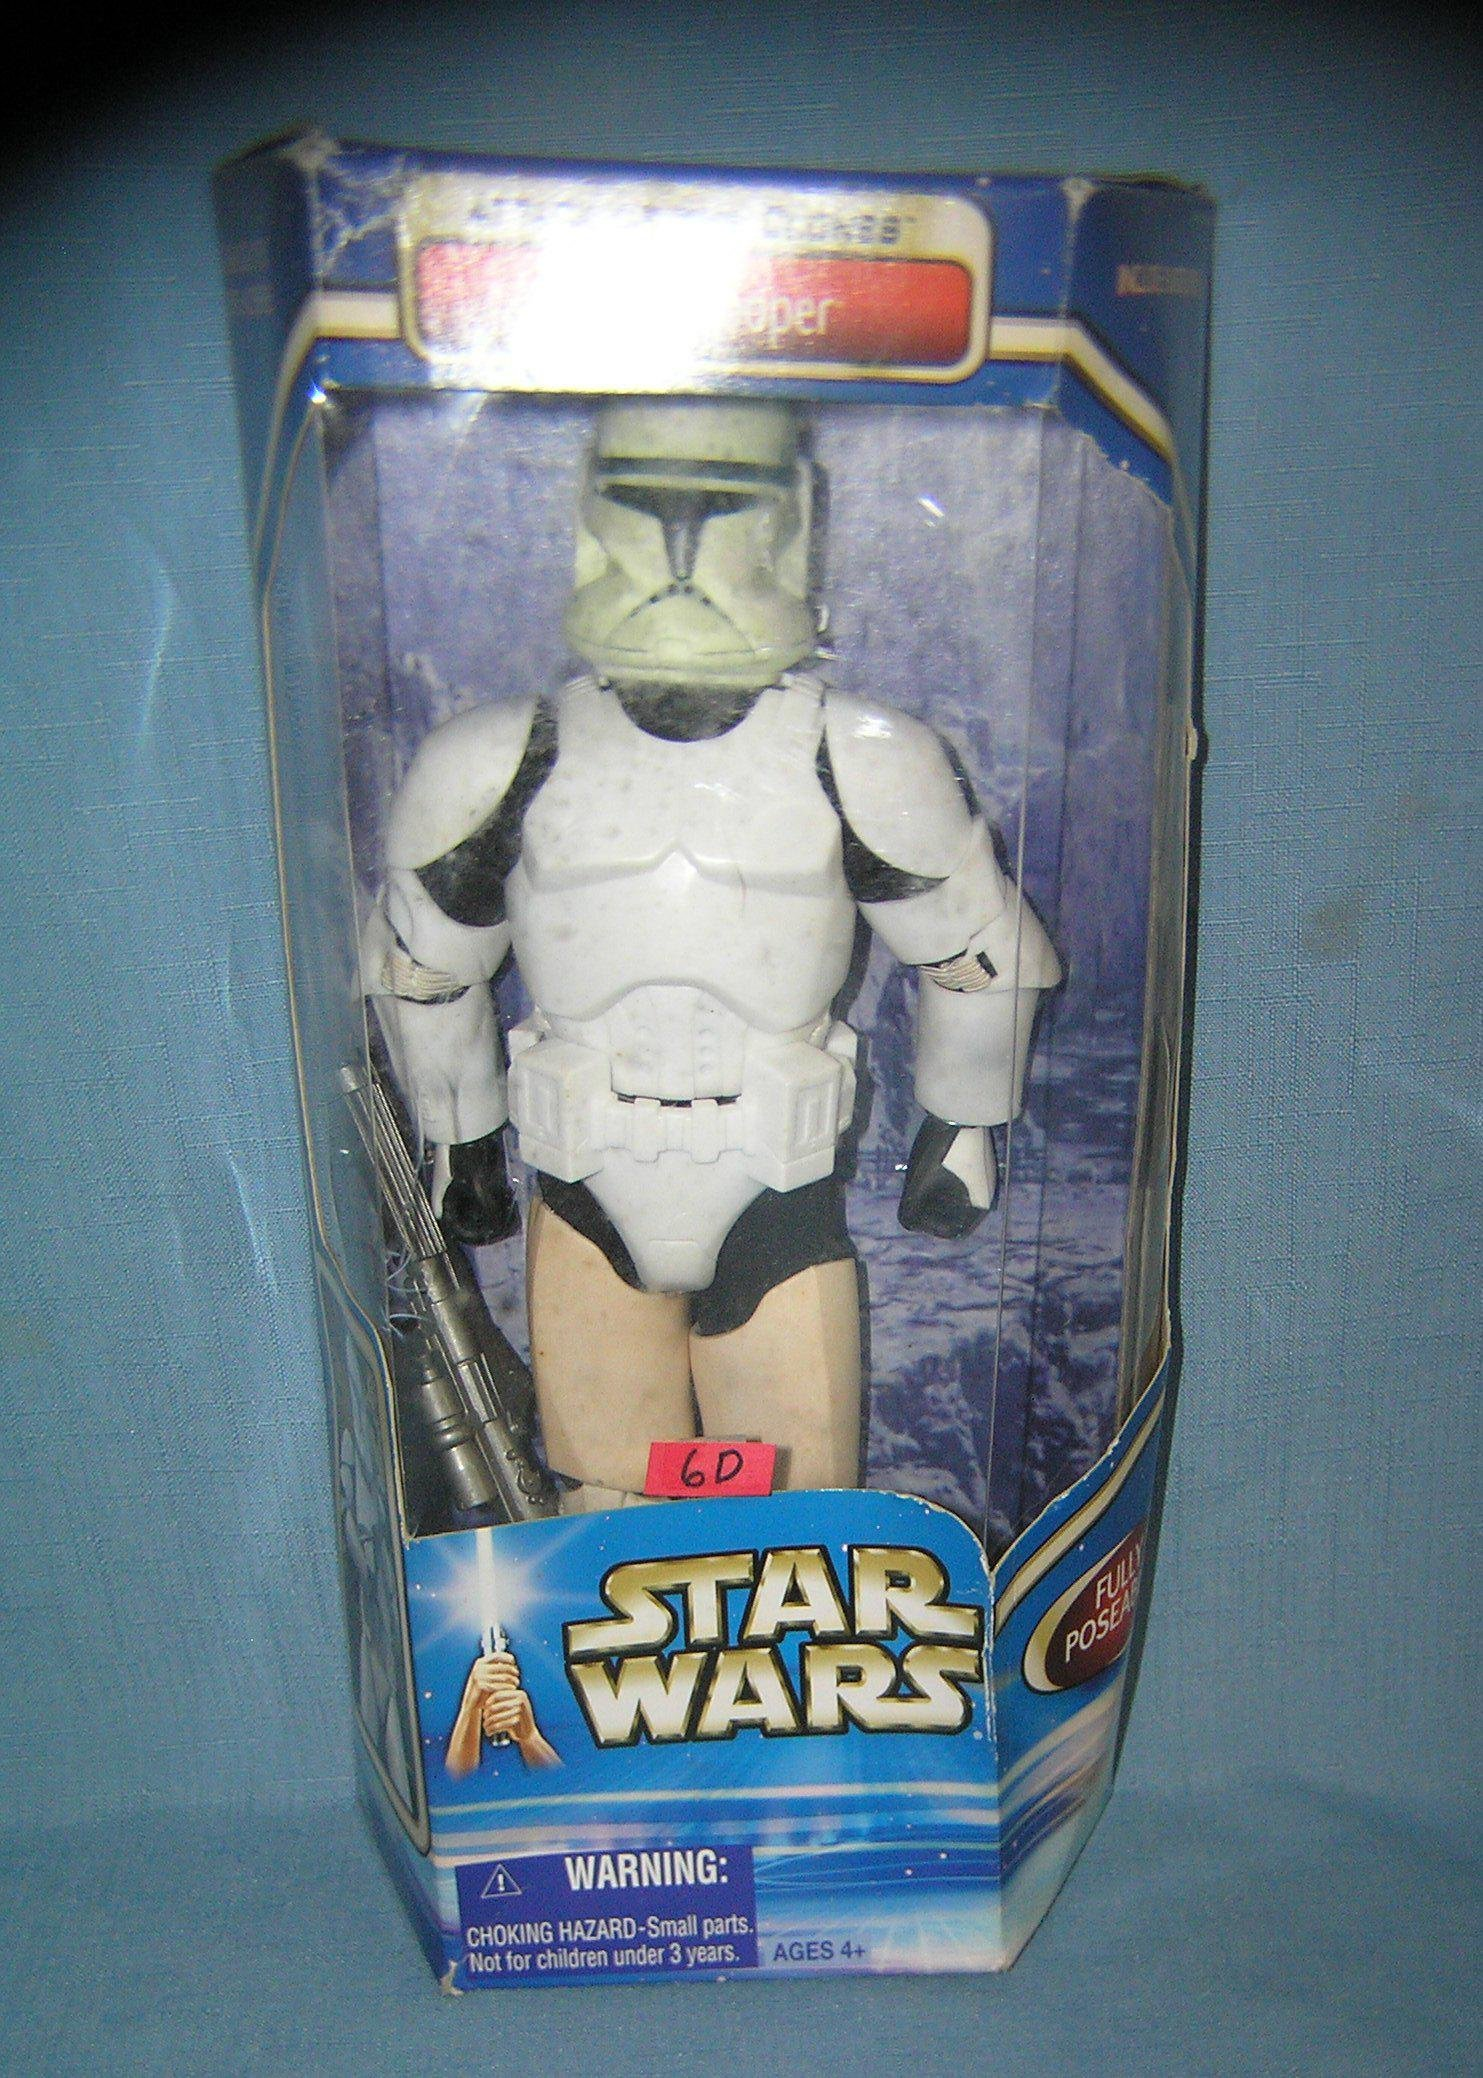 Vintage Star Wars Clone Trooper12 inch action figure